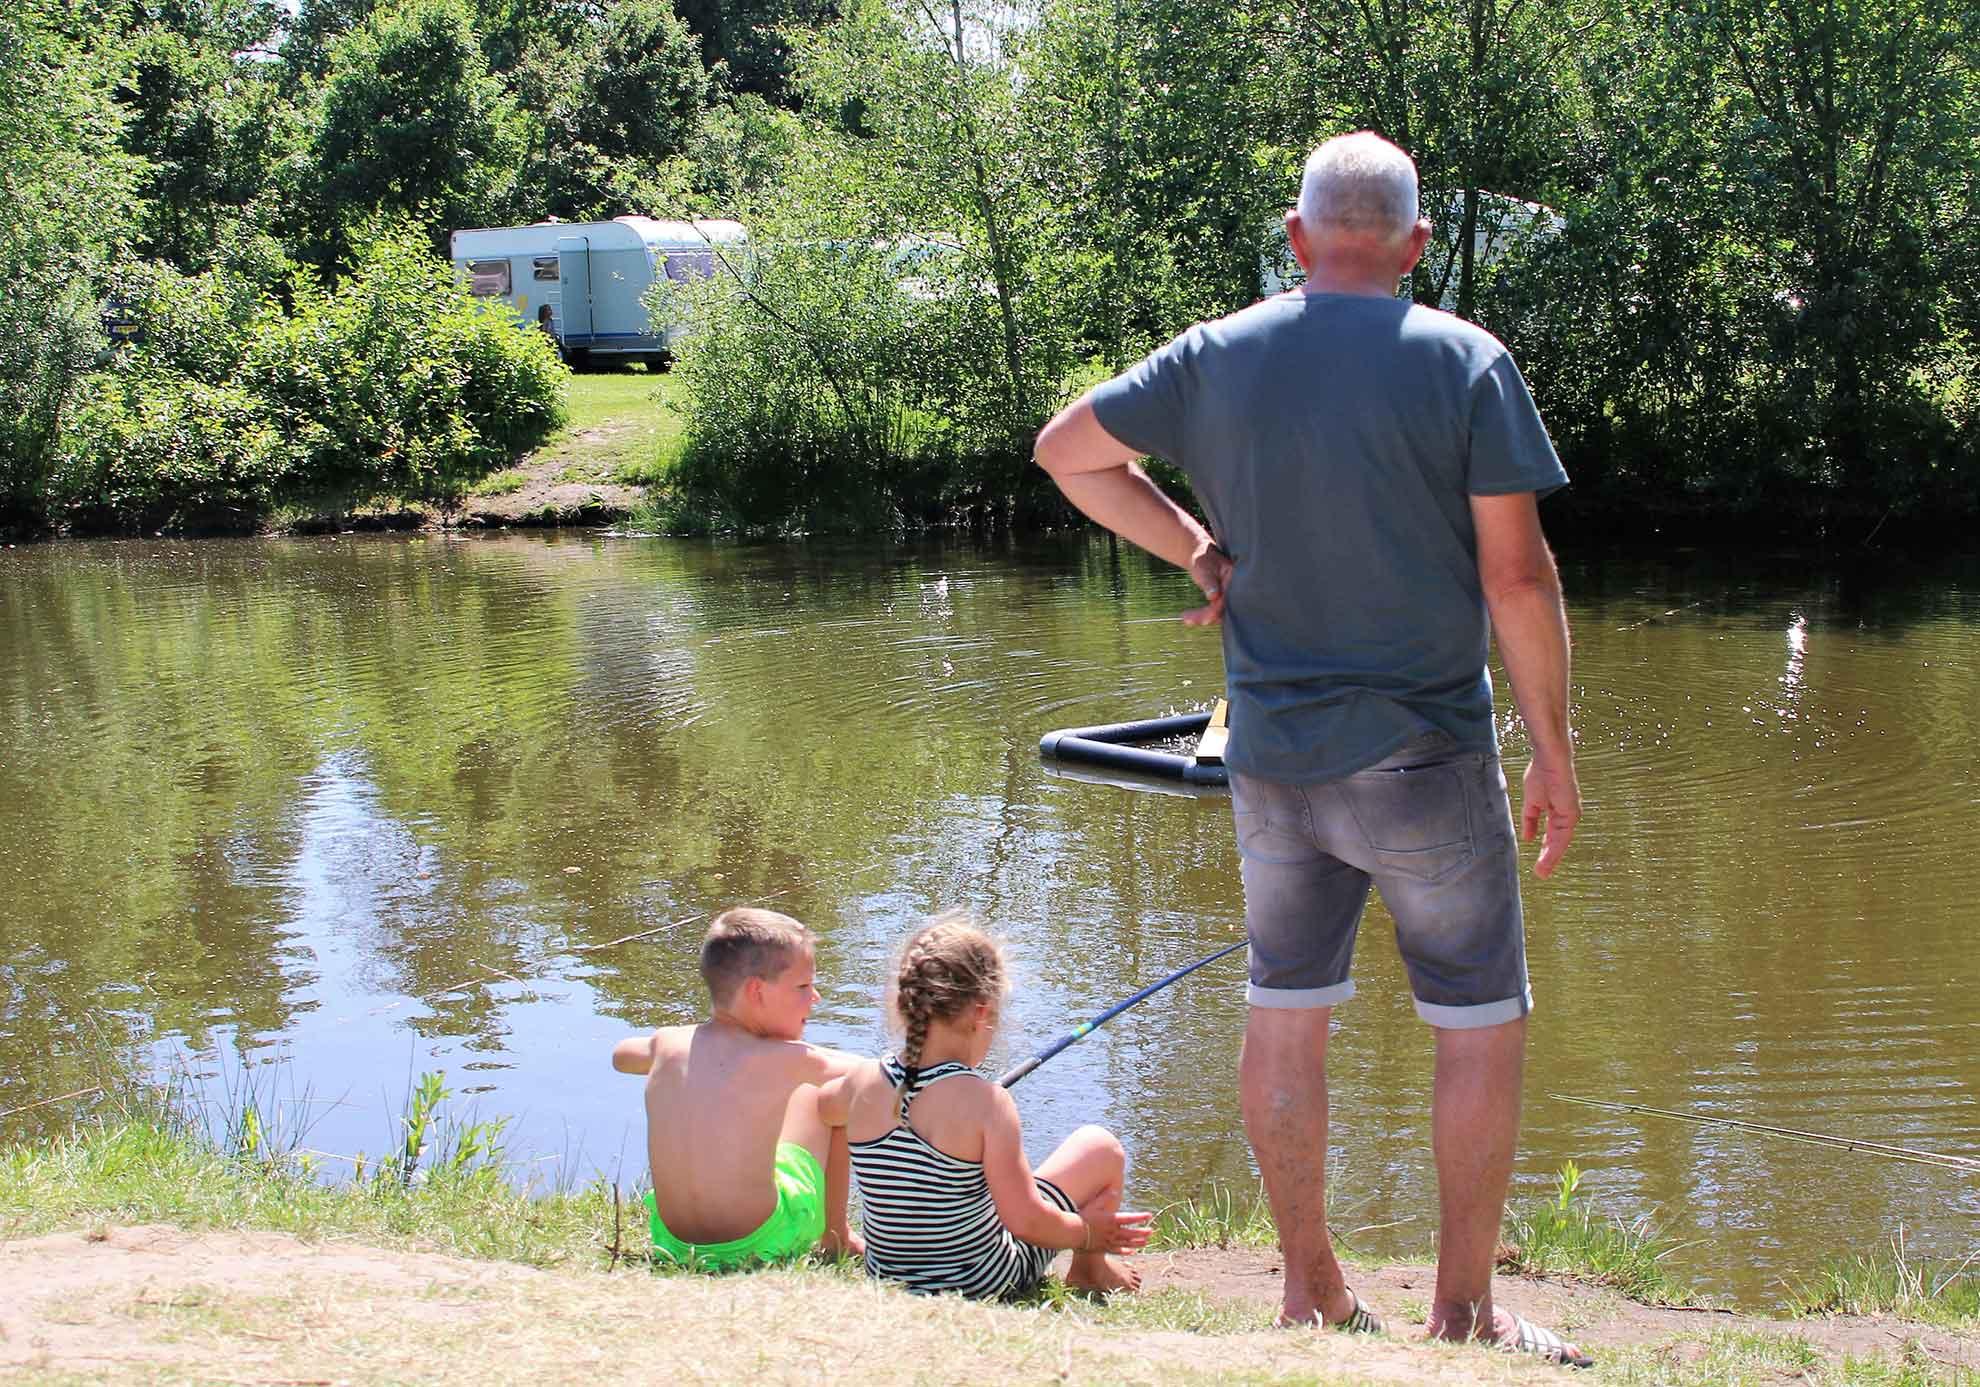 Camping mit Fischteich - Camping mit Fischteich